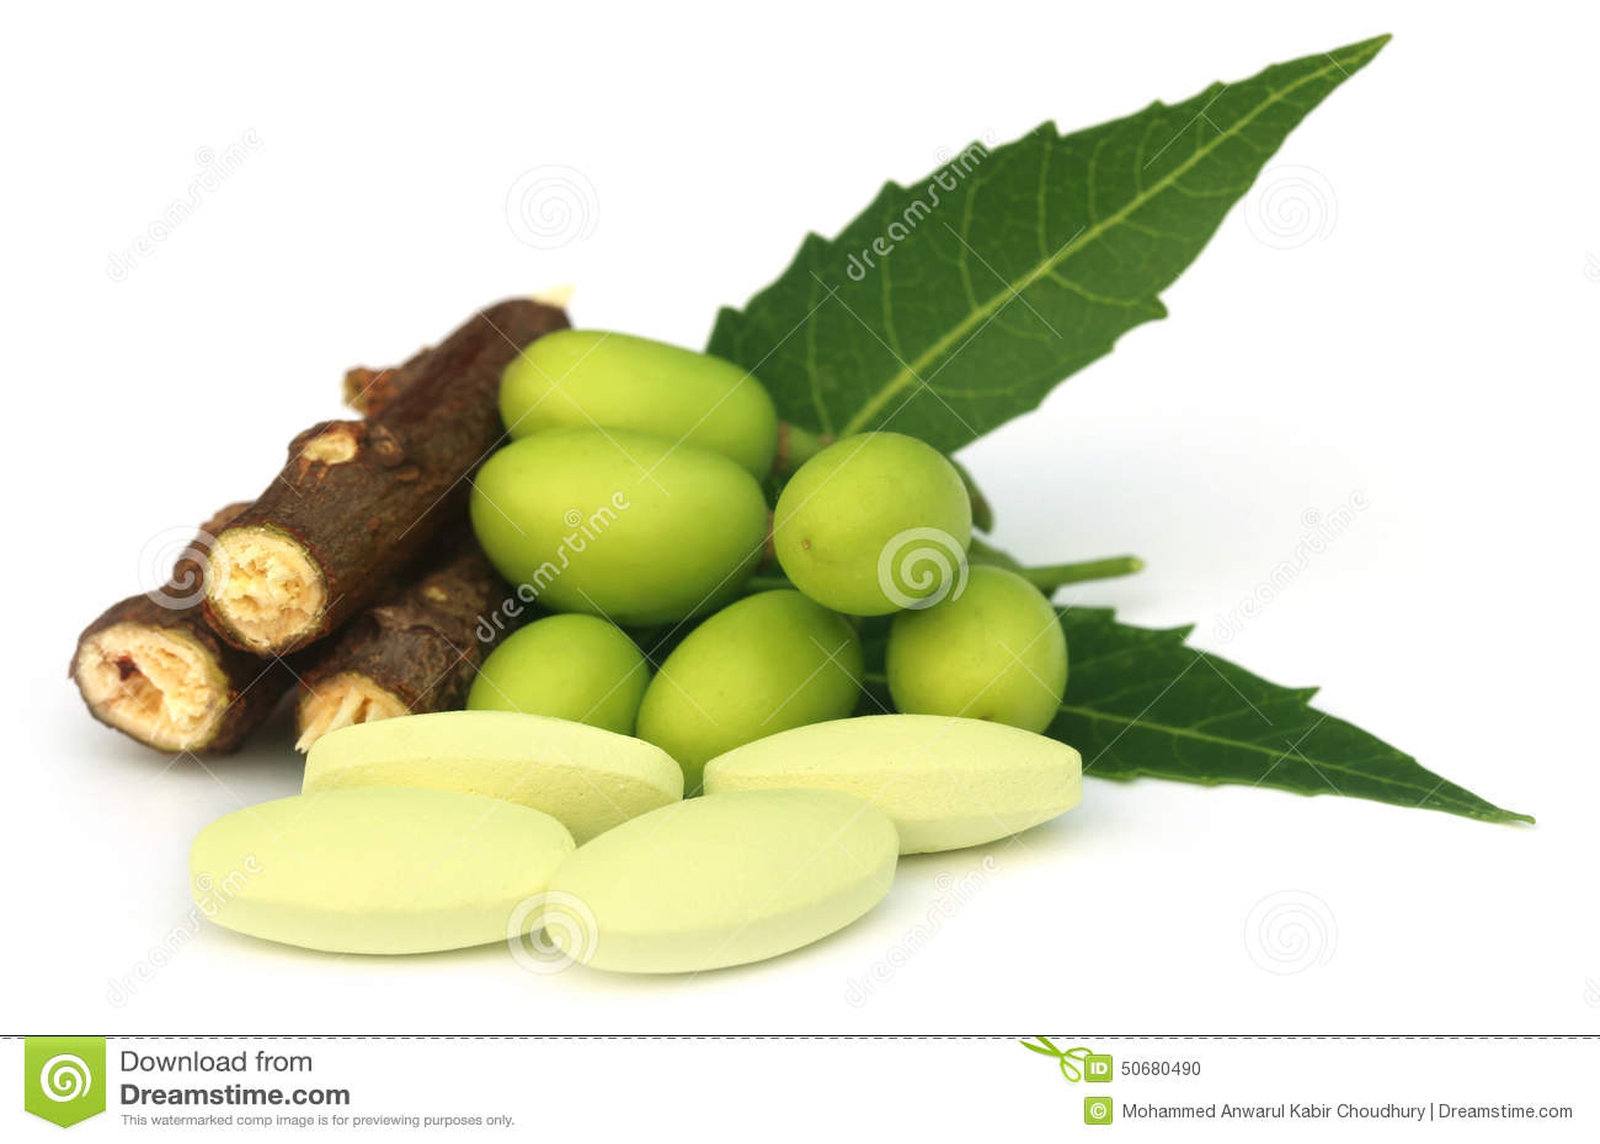 Download 与片剂的医药neem果子 库存照片. 图片 包括有 植被, 片剂, 自然, 健康, 解决, 查出, 草本 - 50680490